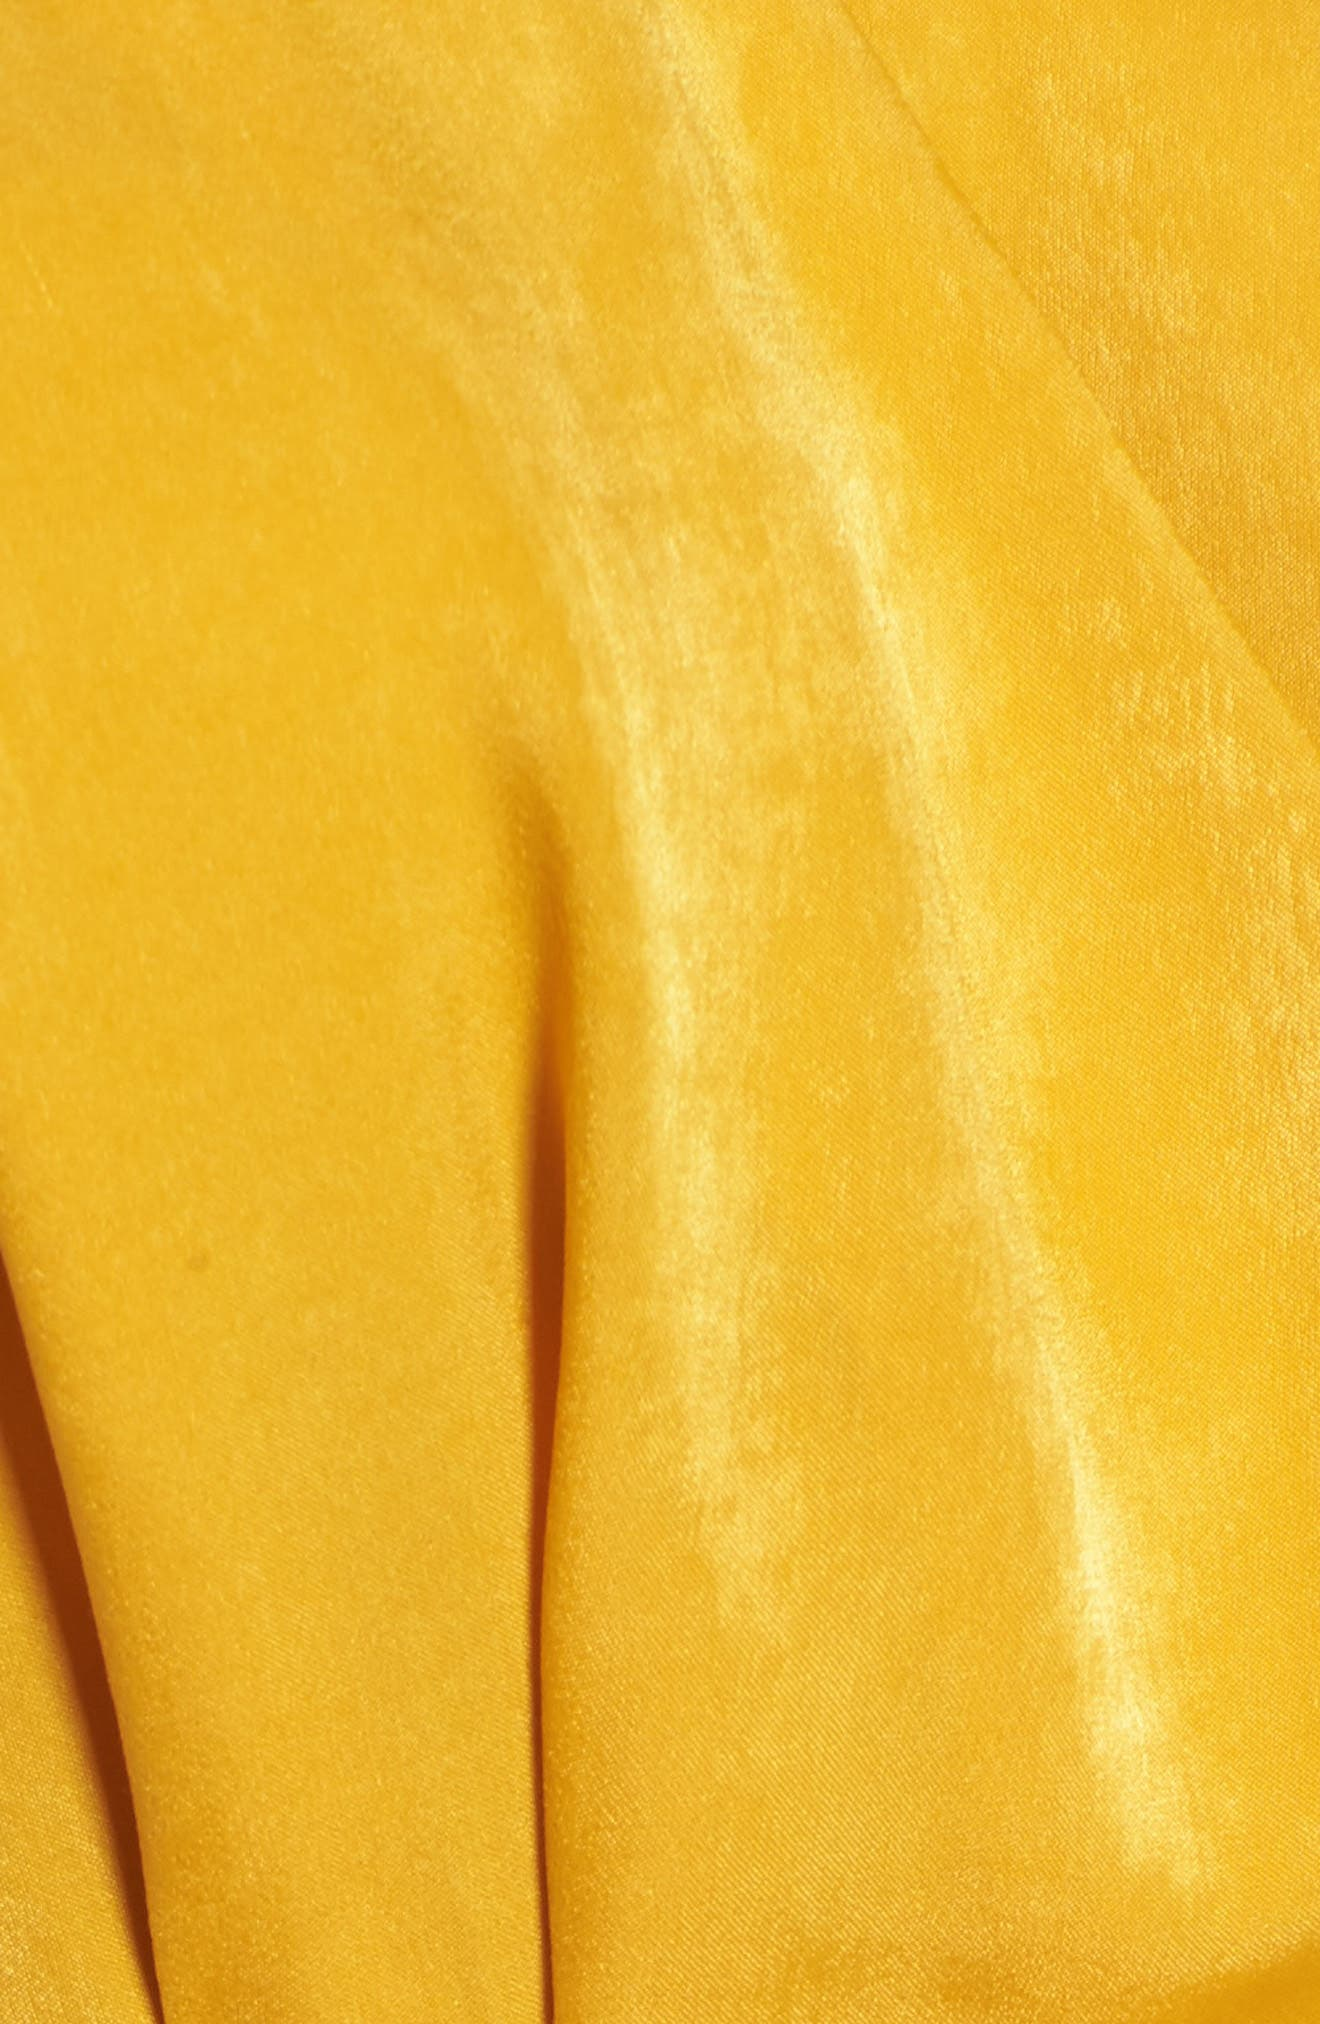 Satin Wrap Top,                             Alternate thumbnail 6, color,                             Mustard